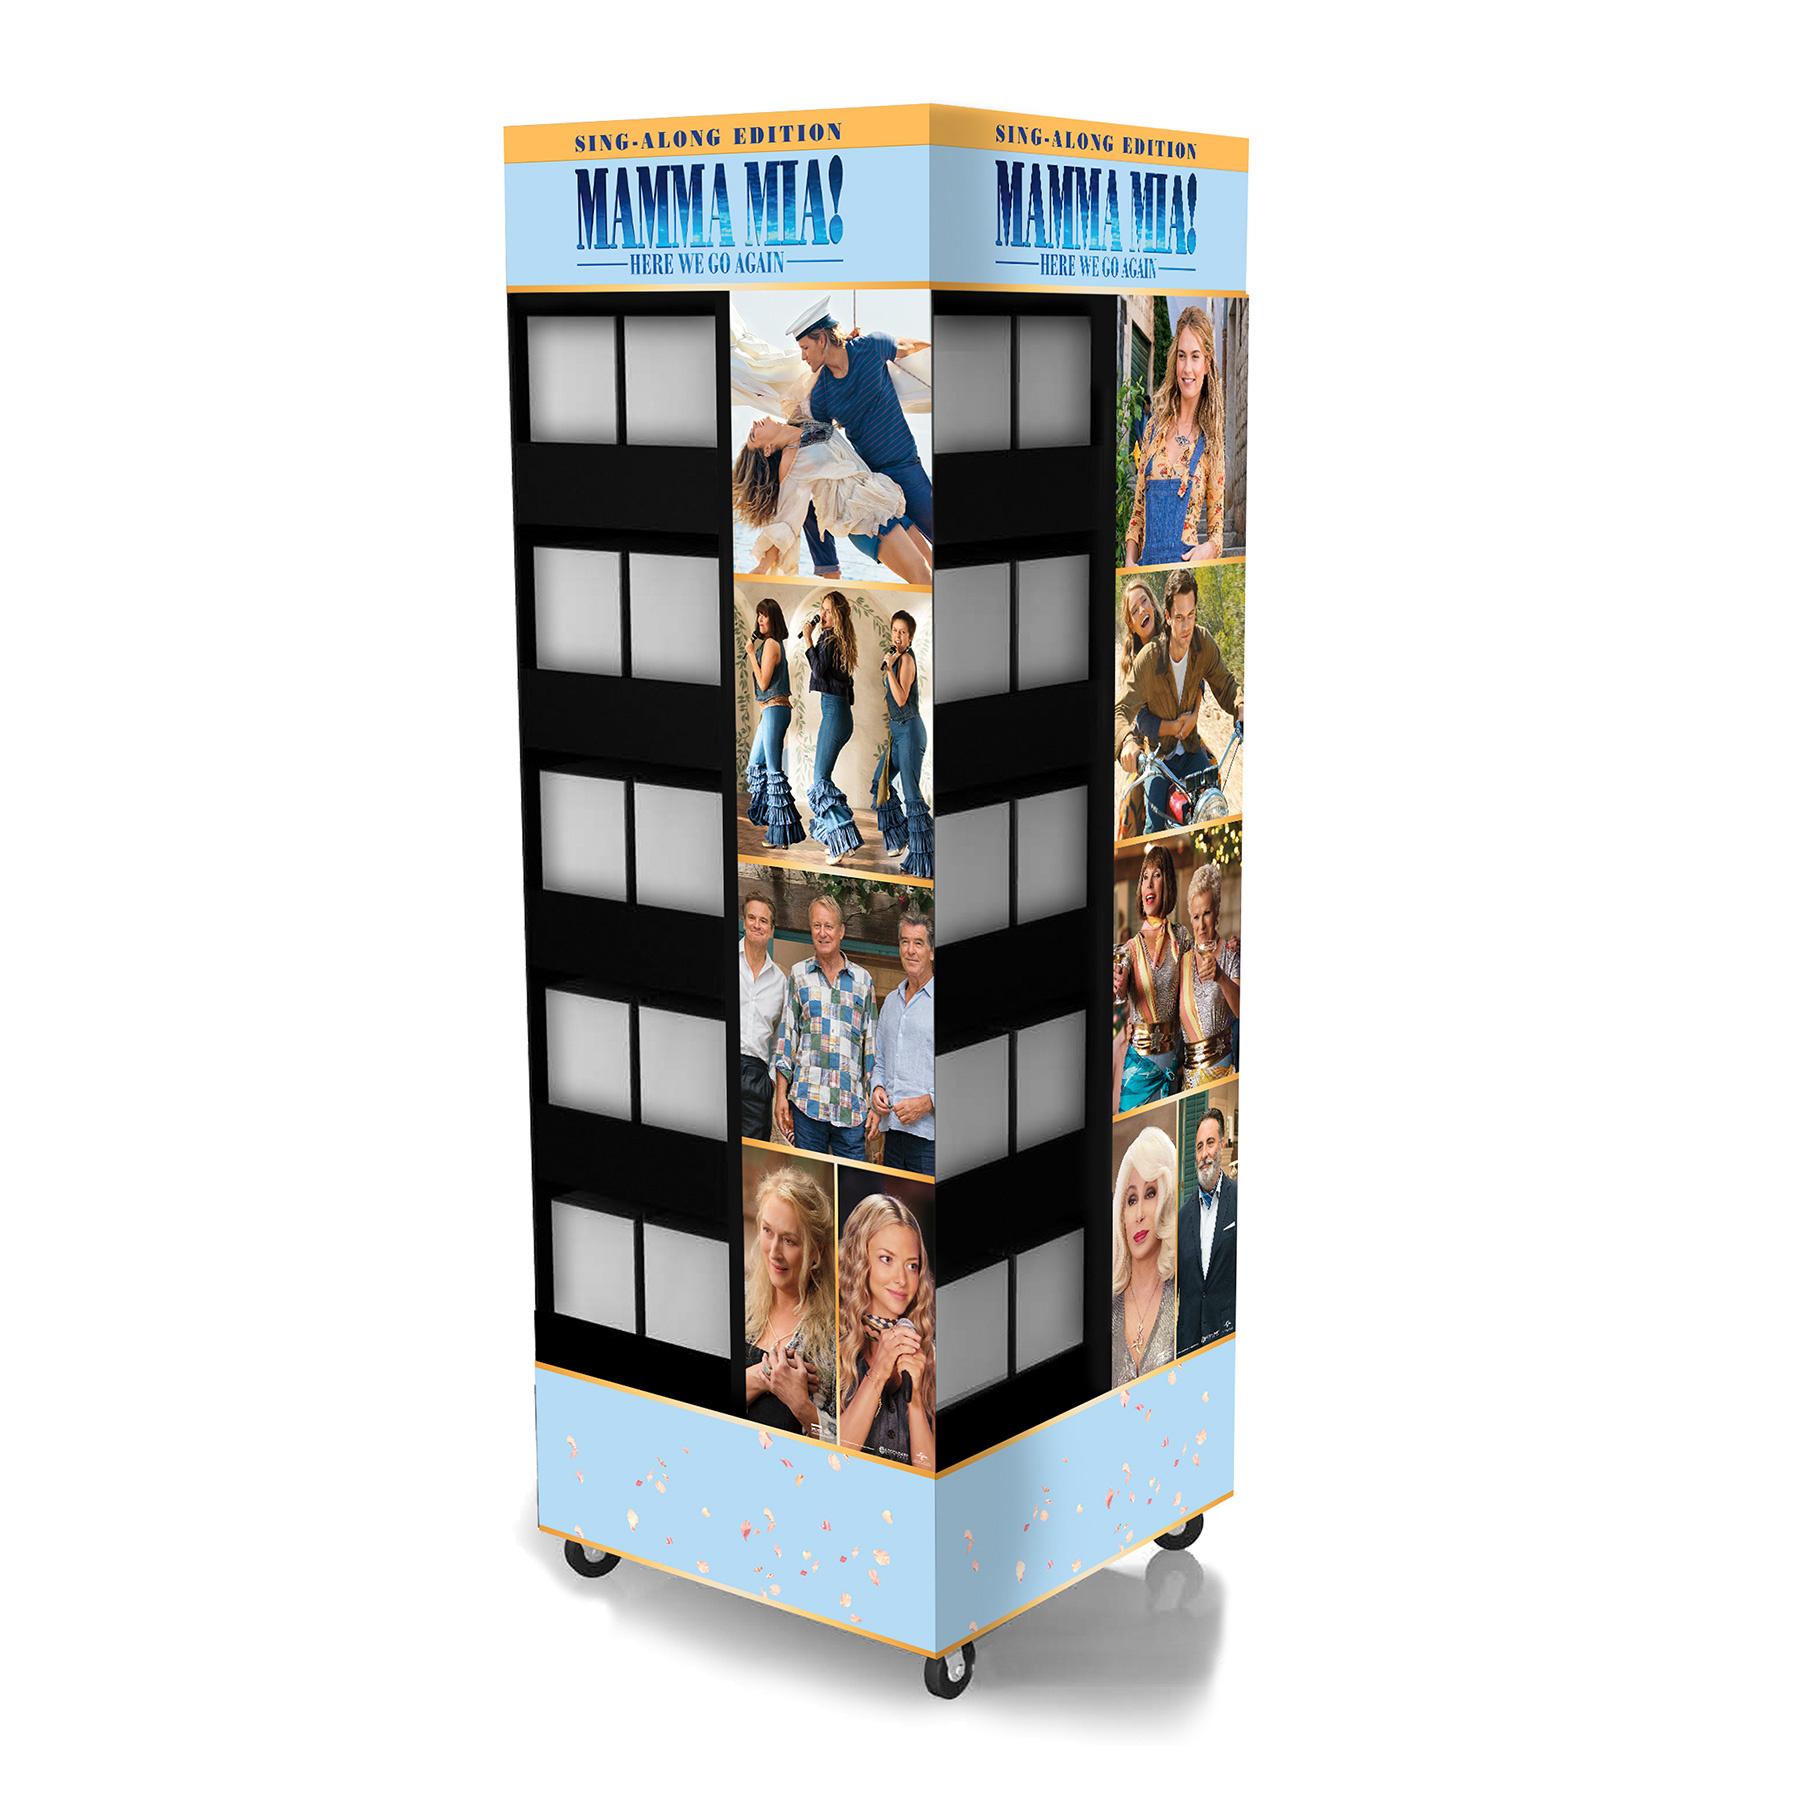 Mamma Mia Rolling Corrugate Display